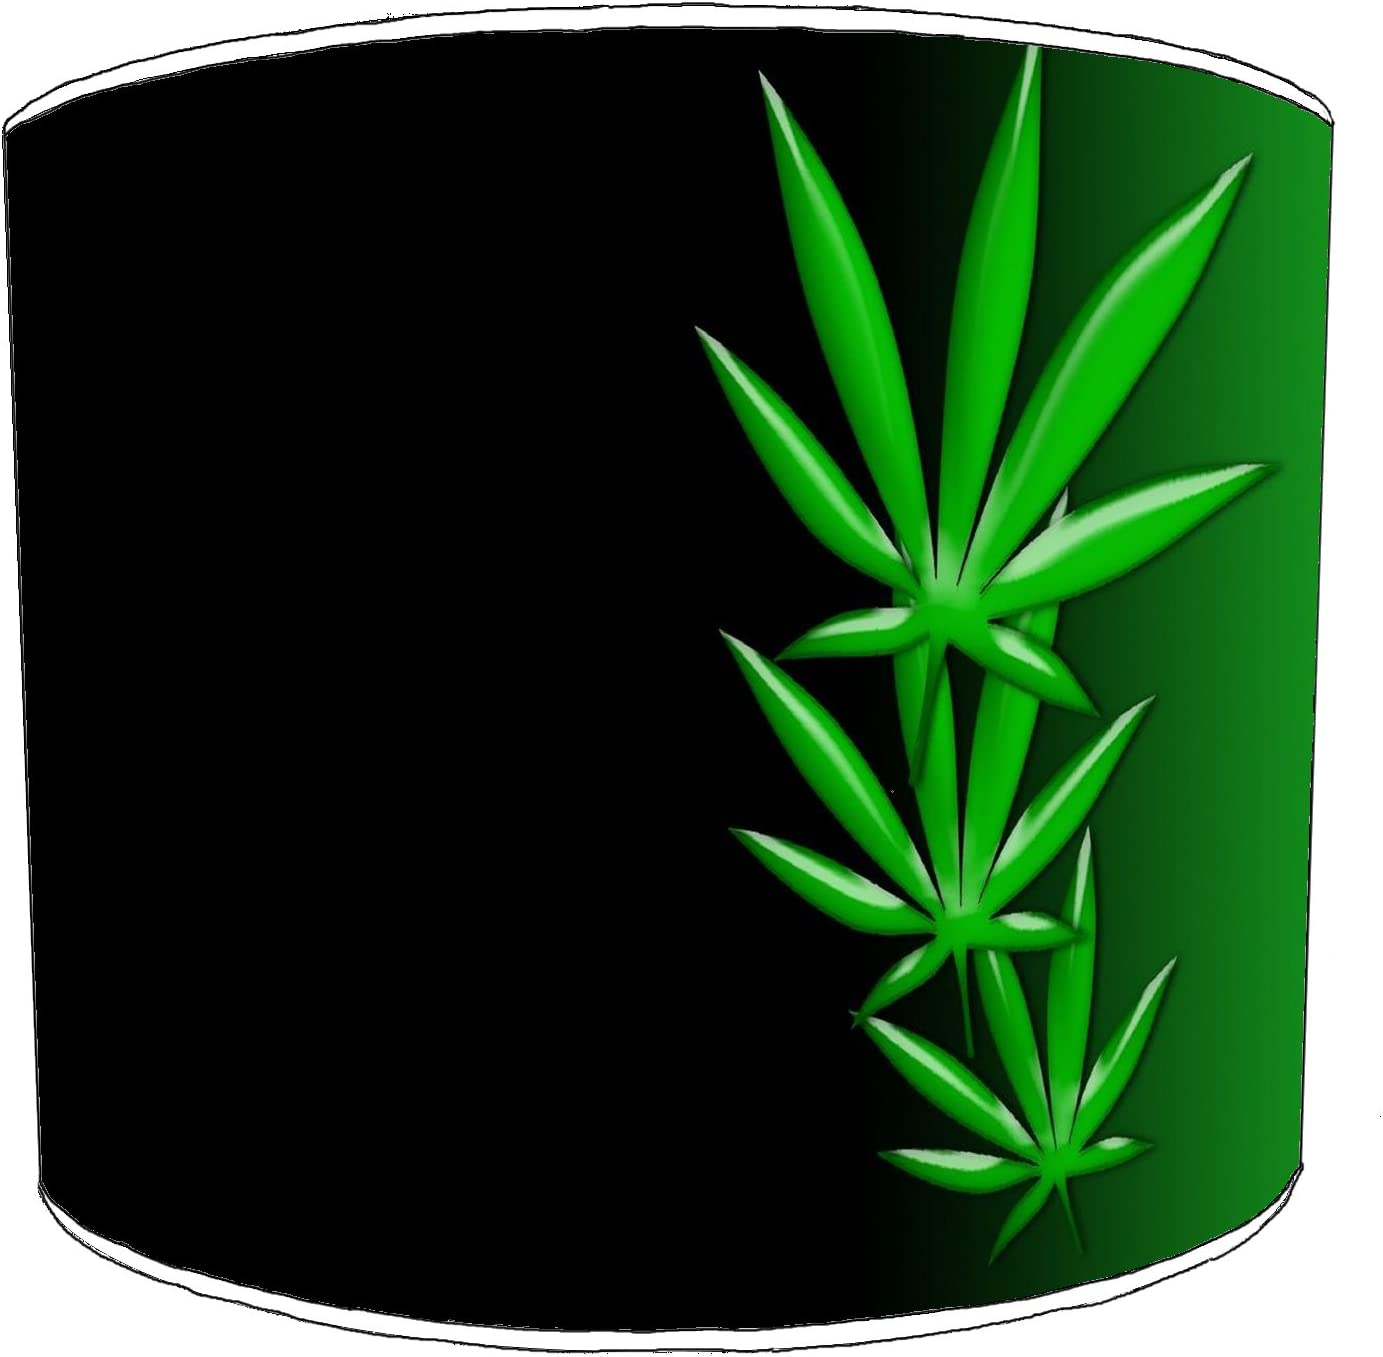 Premier Lighting 12 Inch Ceiling Marijuana Weed lampshades12